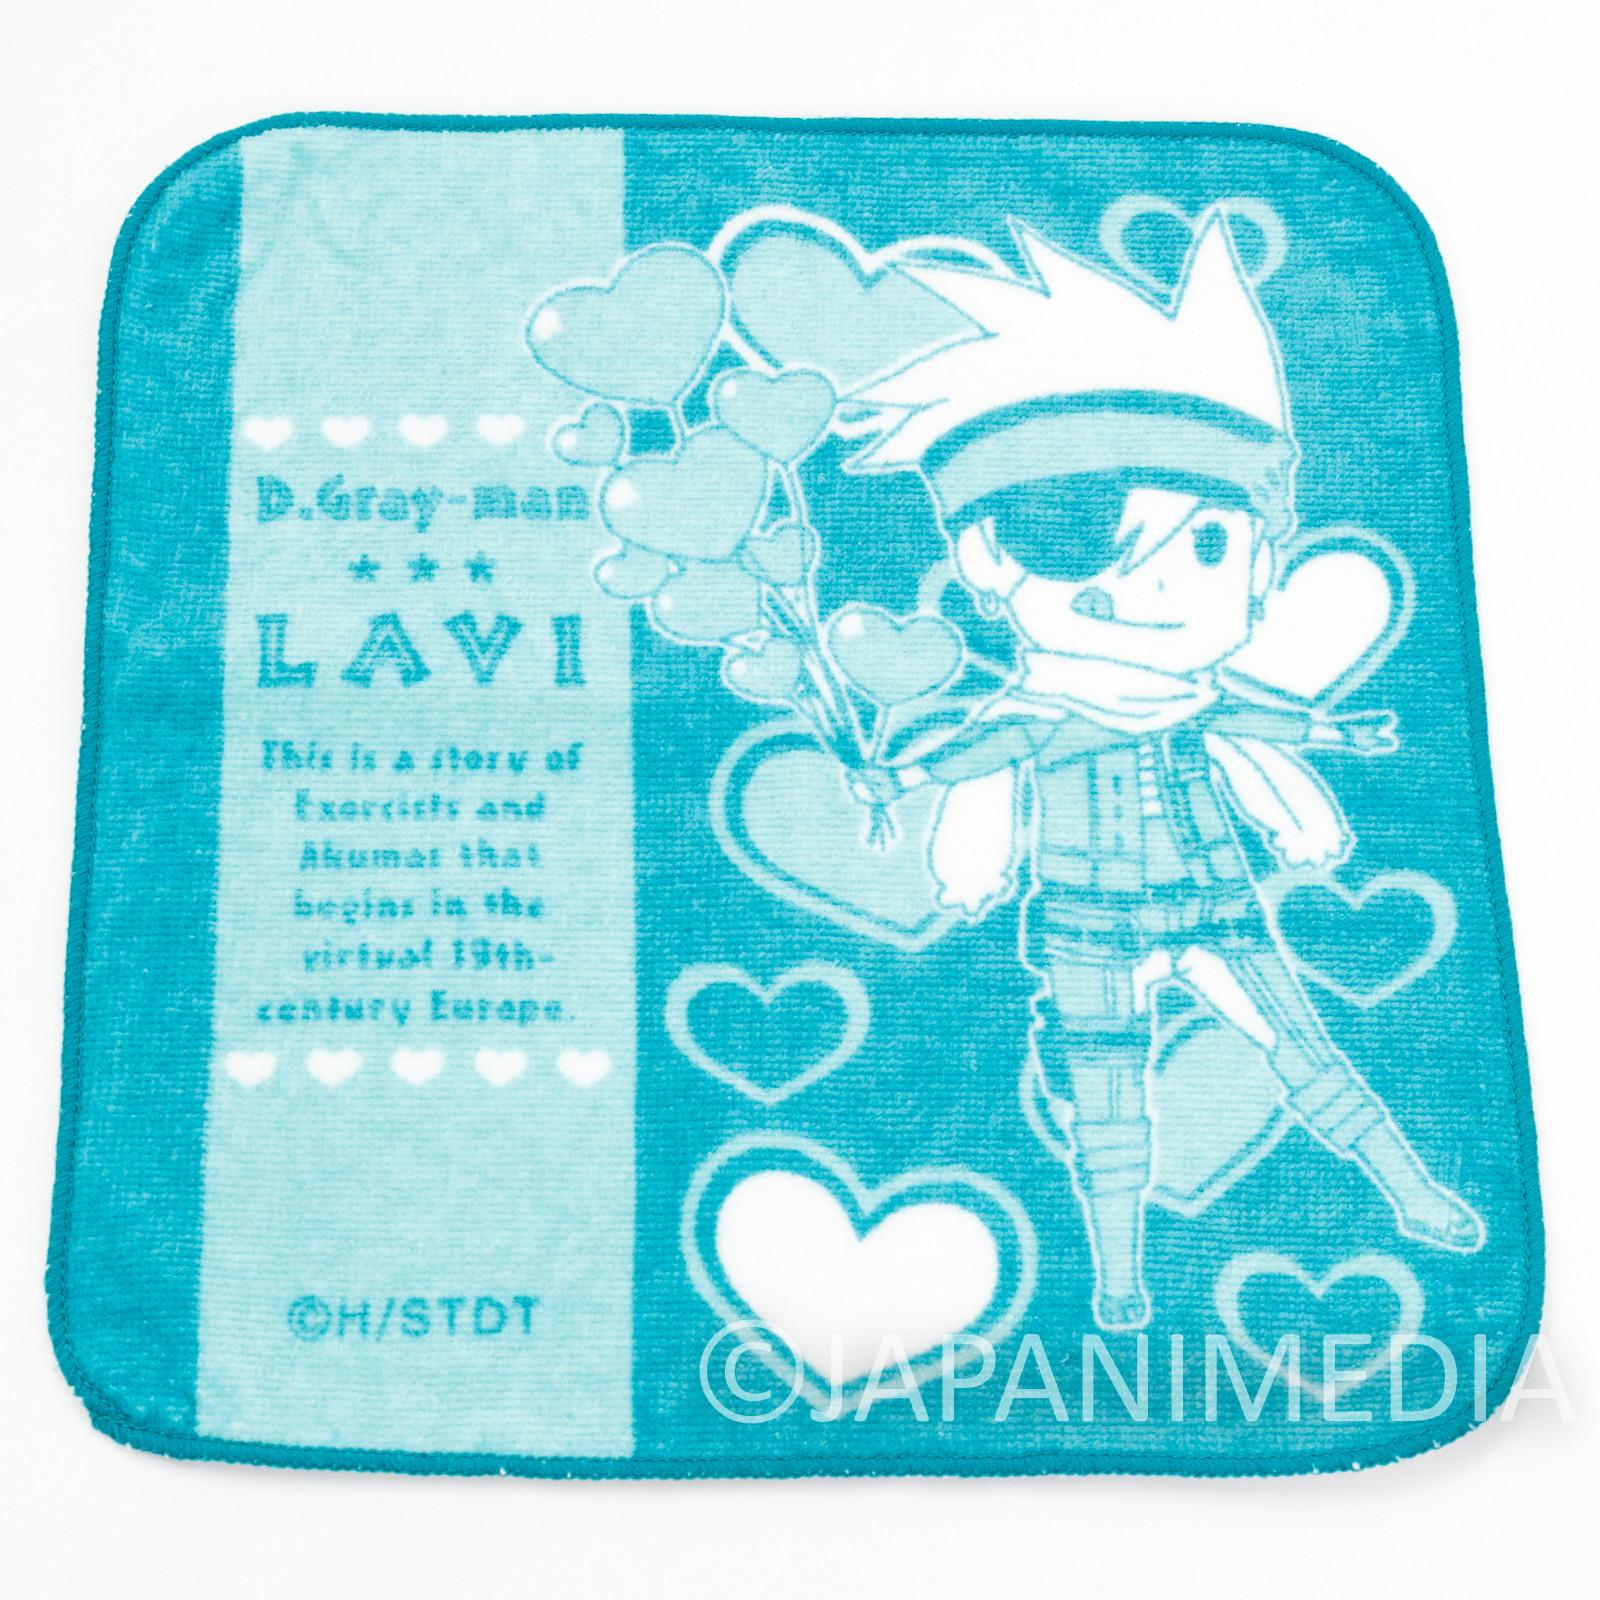 D.Gray-man Lavi Hand Towel 8x8 inch Movic JAPAN ANIME MANGA